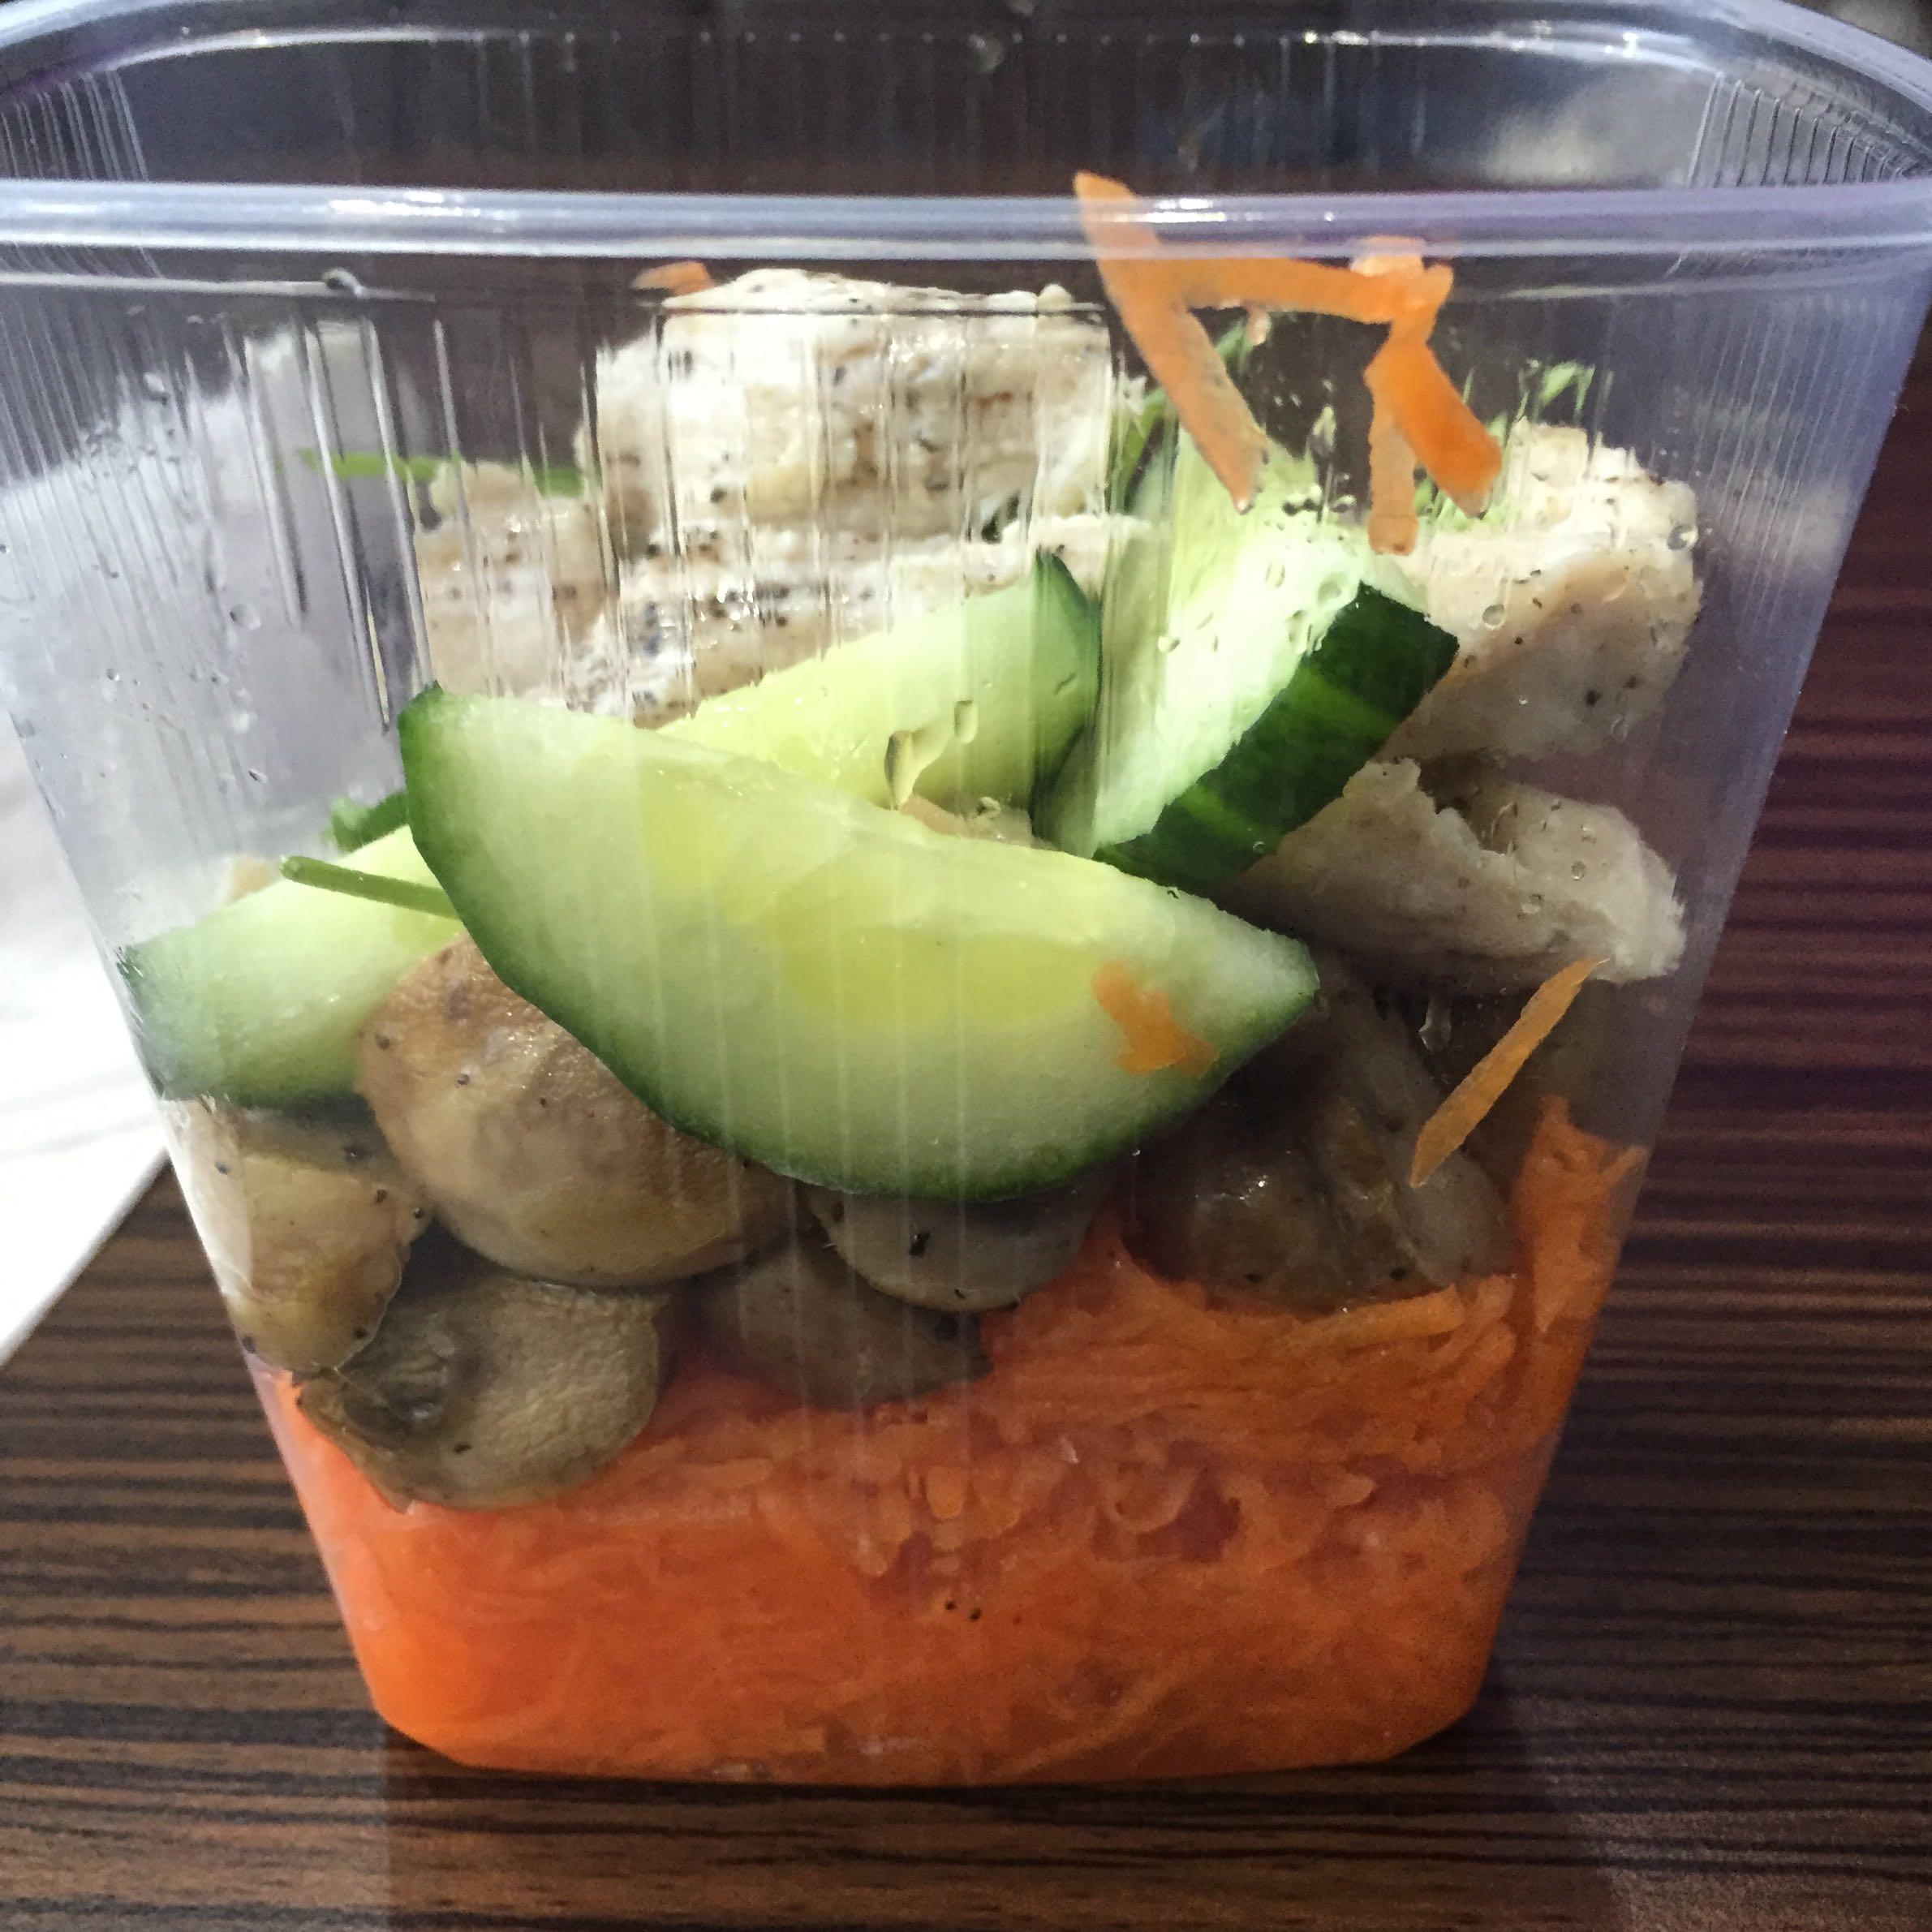 Wie viele Kalorien hat der Salat (edeka,244g)? (Ernährung)